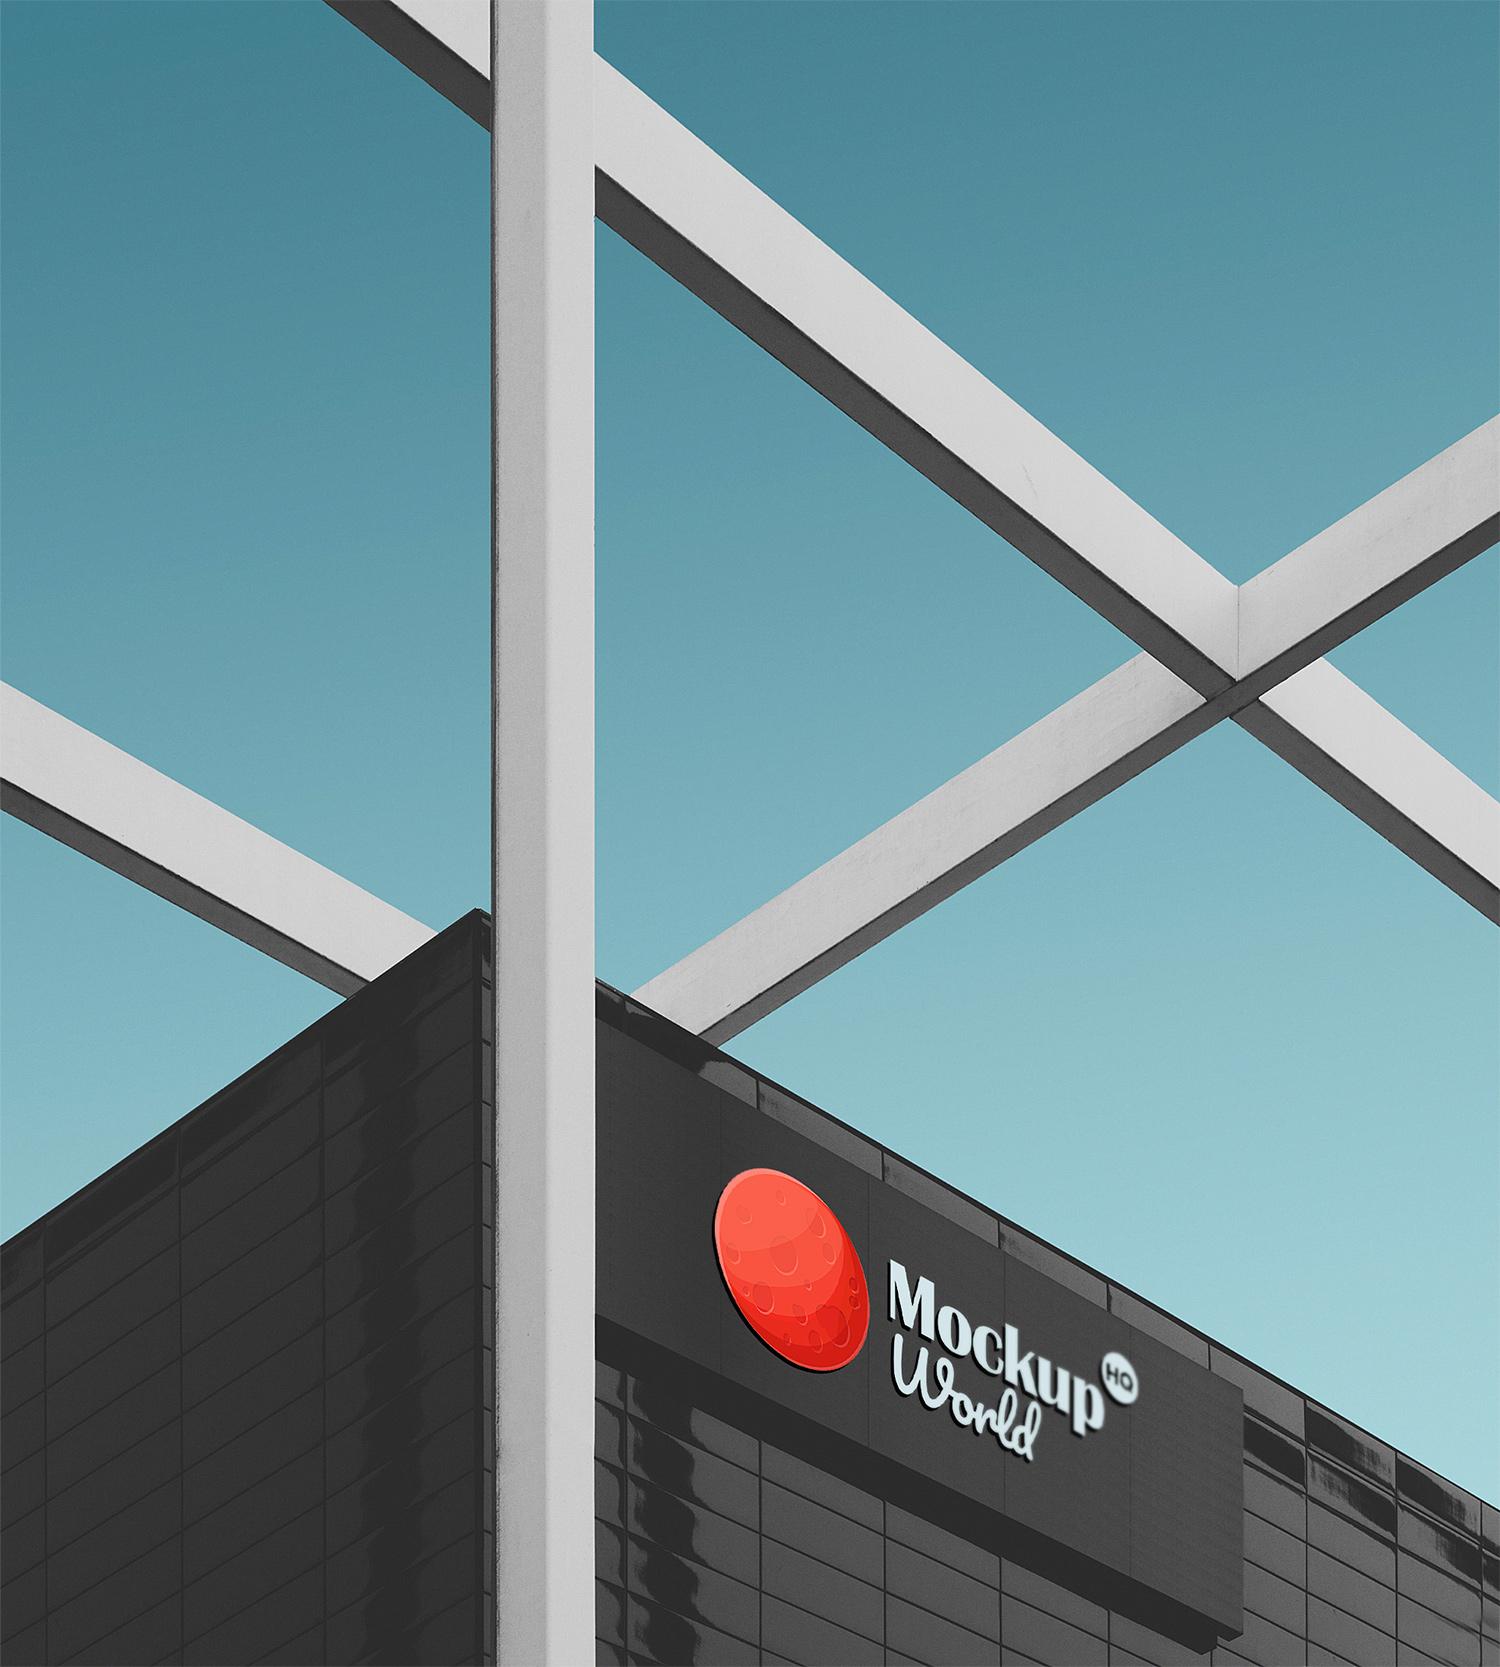 Commercial Office Building Billboard Mockup PSD